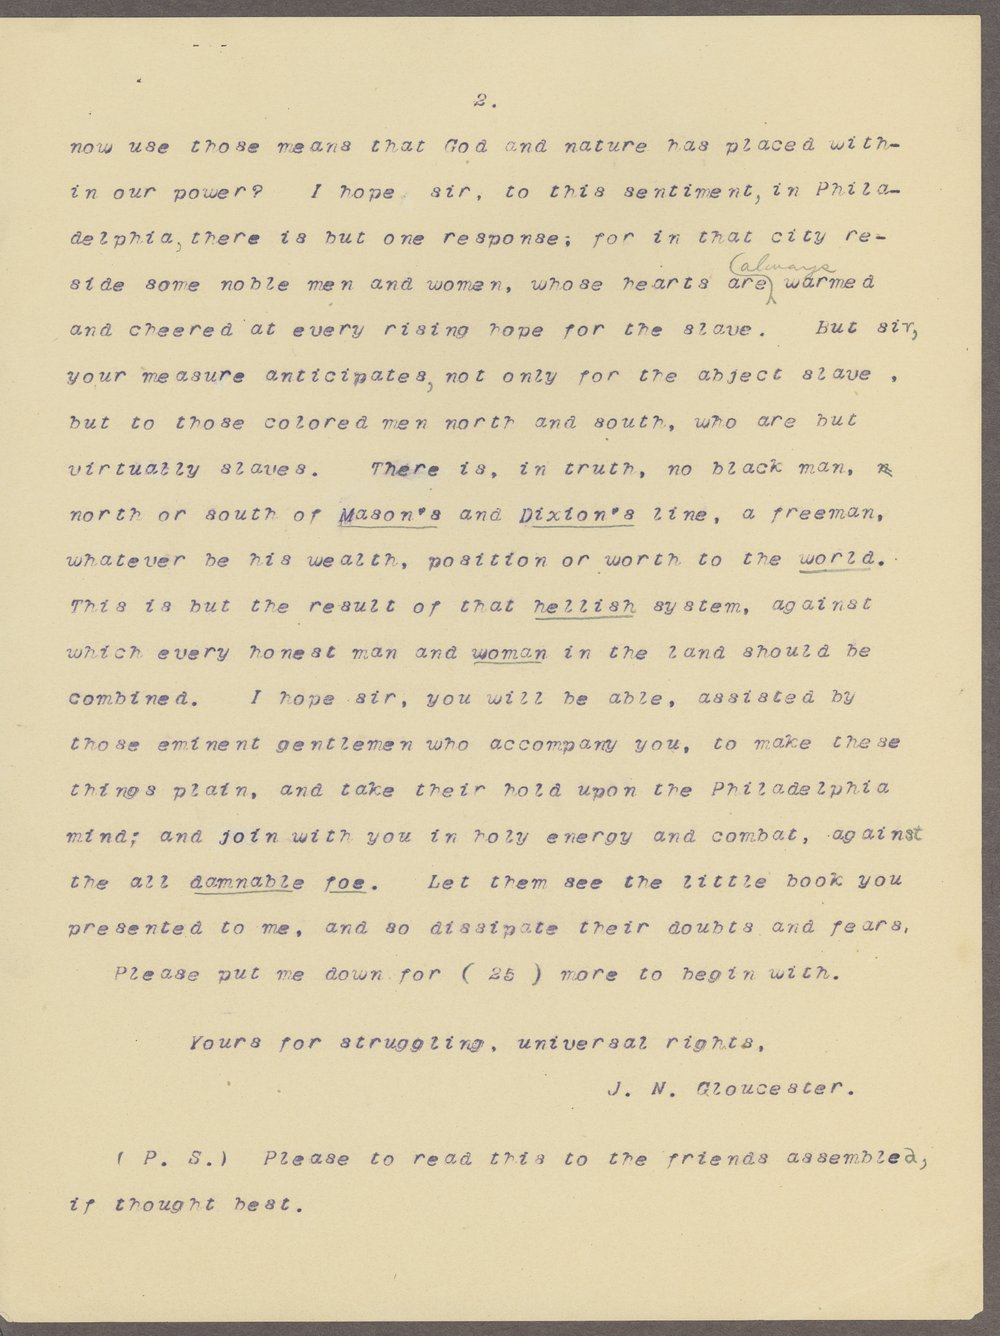 James N. Gloucester to John Brown - 6